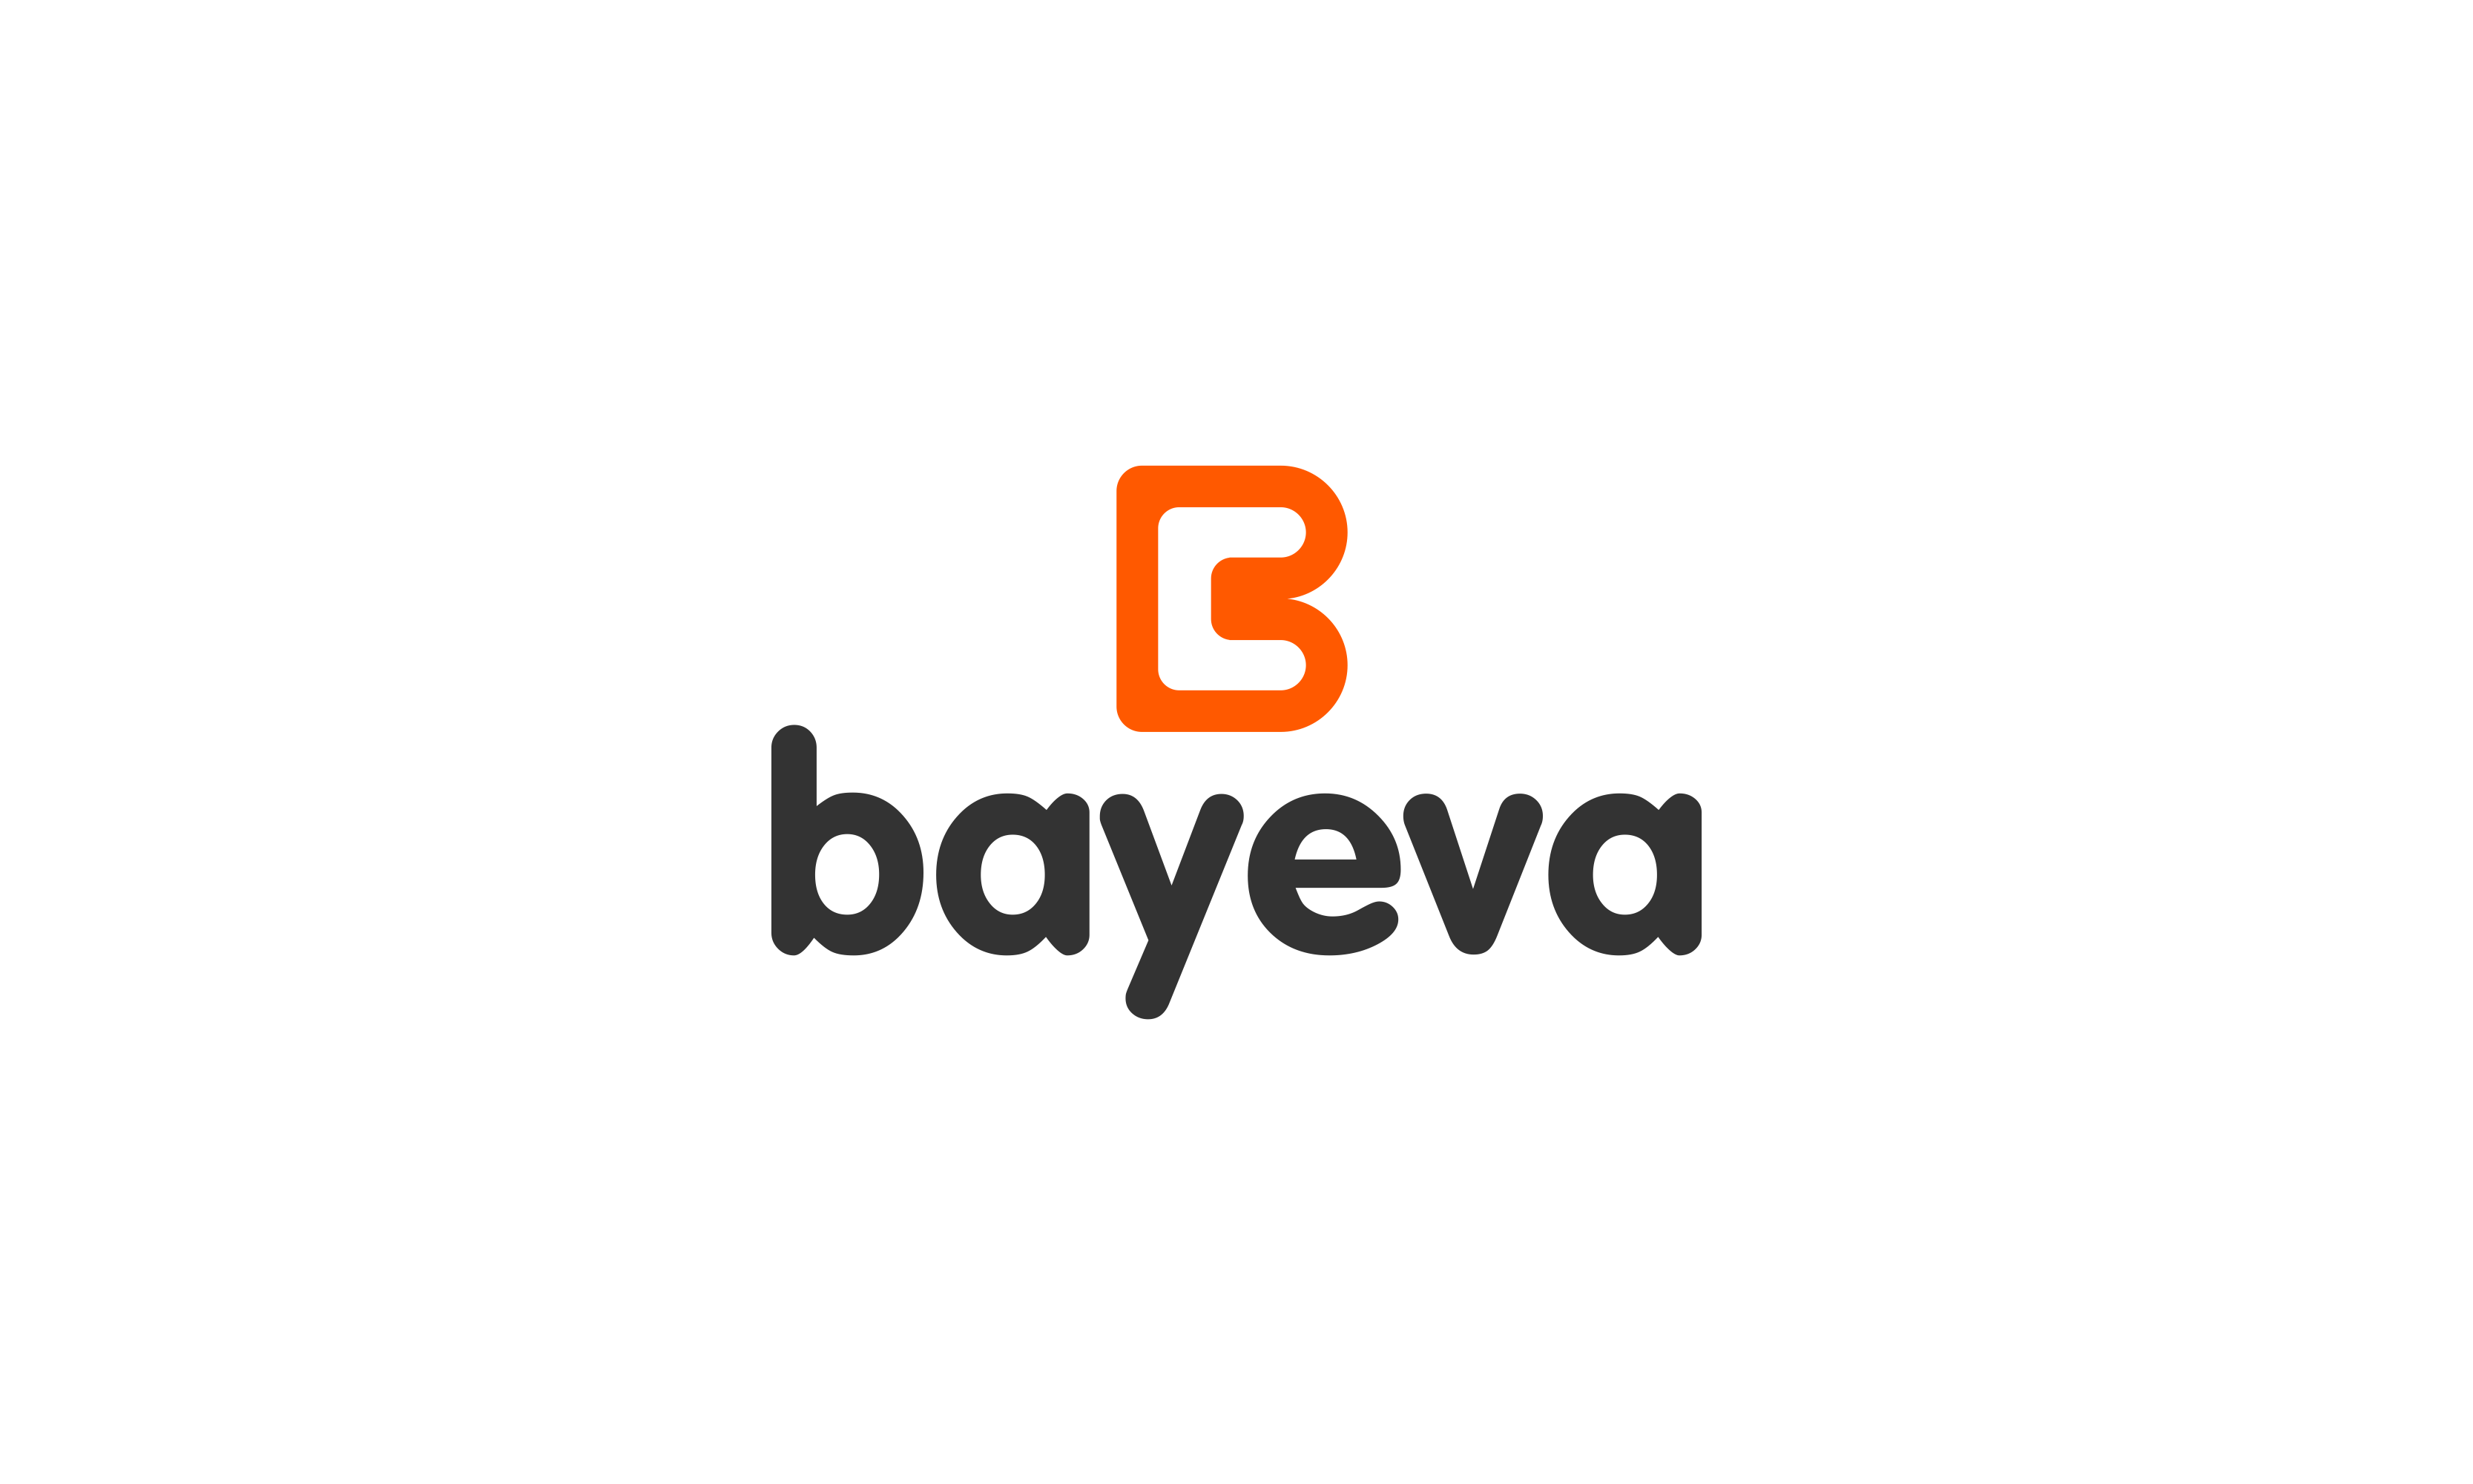 Bayeva